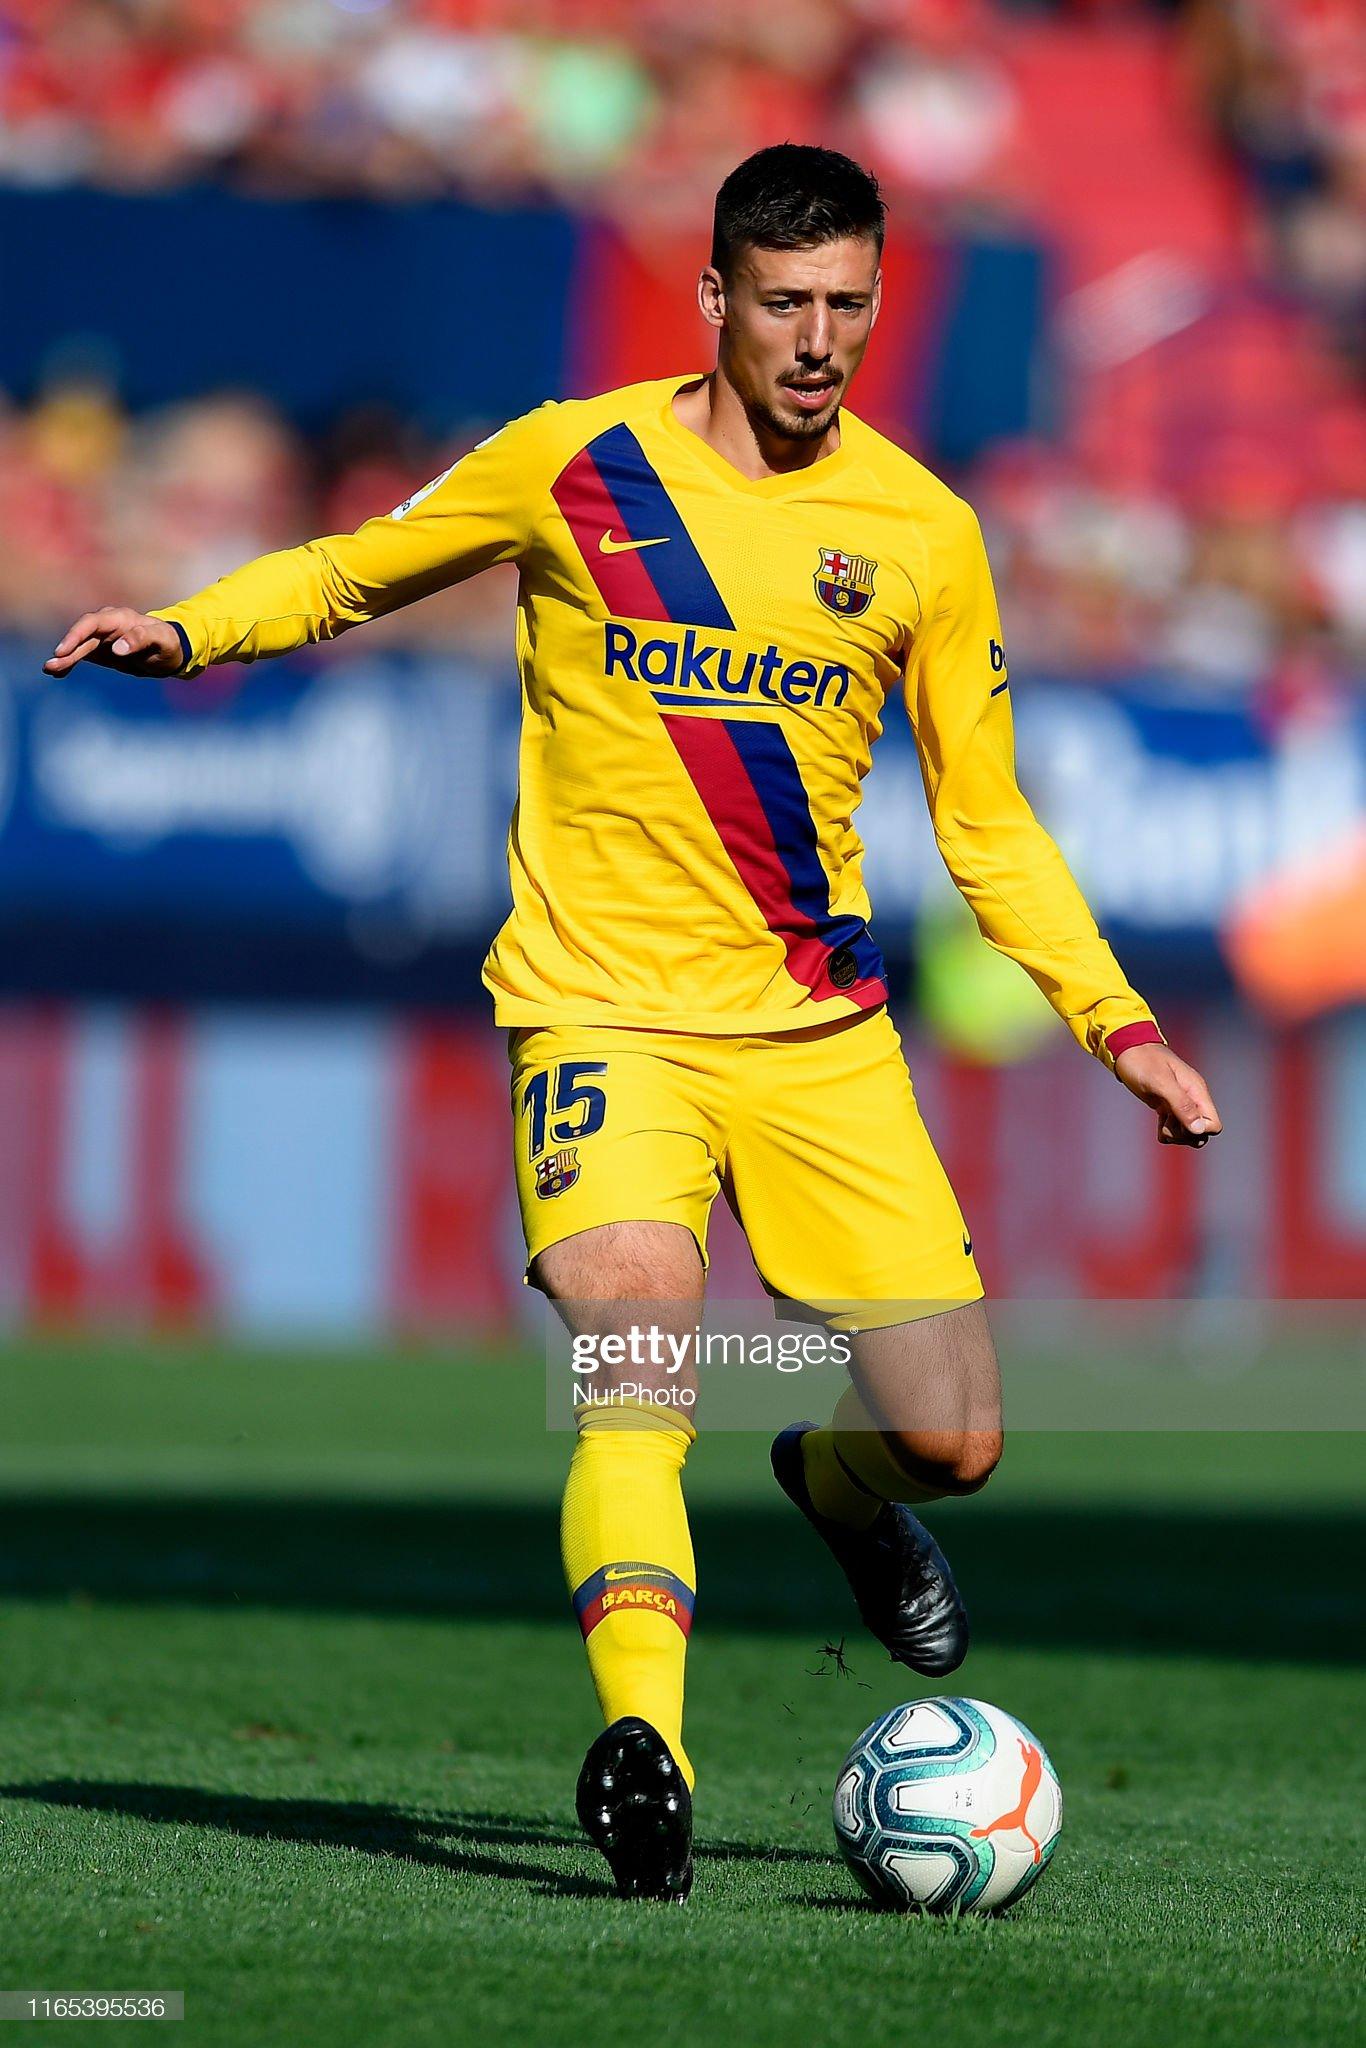 صور مباراة : أوساسونا - برشلونة 2-2 ( 31-08-2019 )  Clement-lenglet-of-barcelona-in-action-during-the-liga-match-between-picture-id1165395536?s=2048x2048